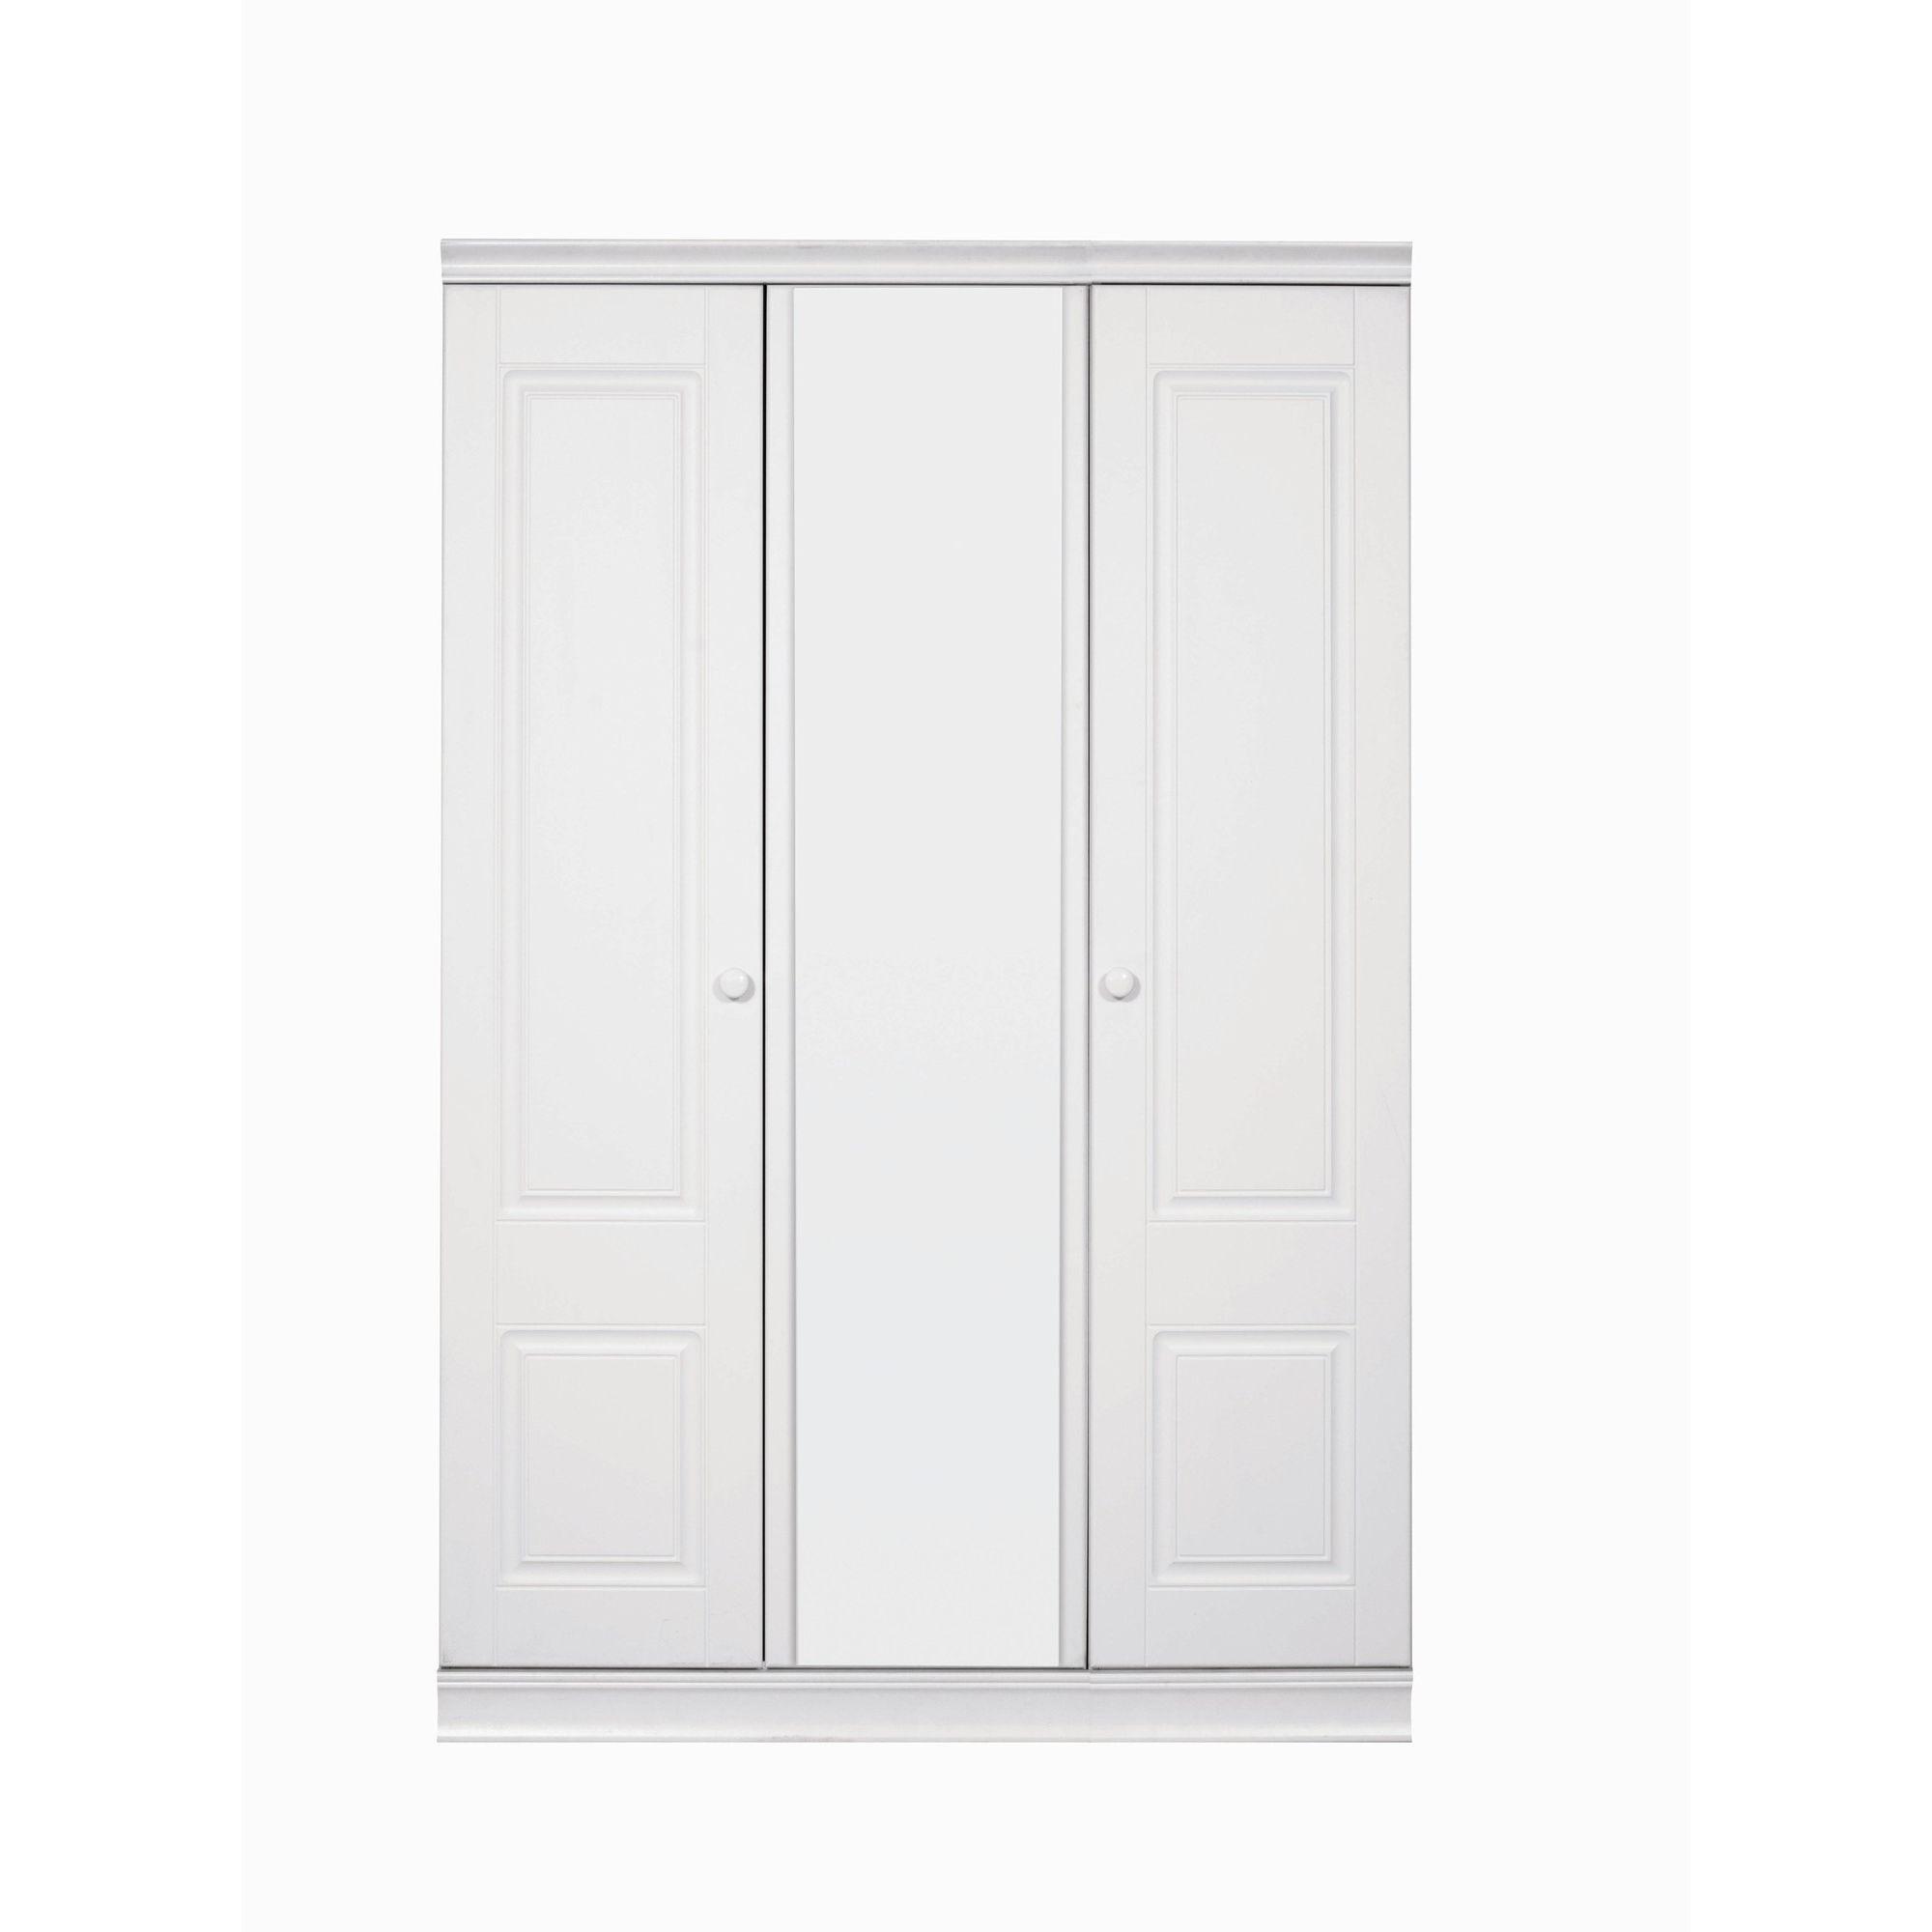 Caxton Henley 3 Door Short Height Mirrored Wardrobe at Tesco Direct